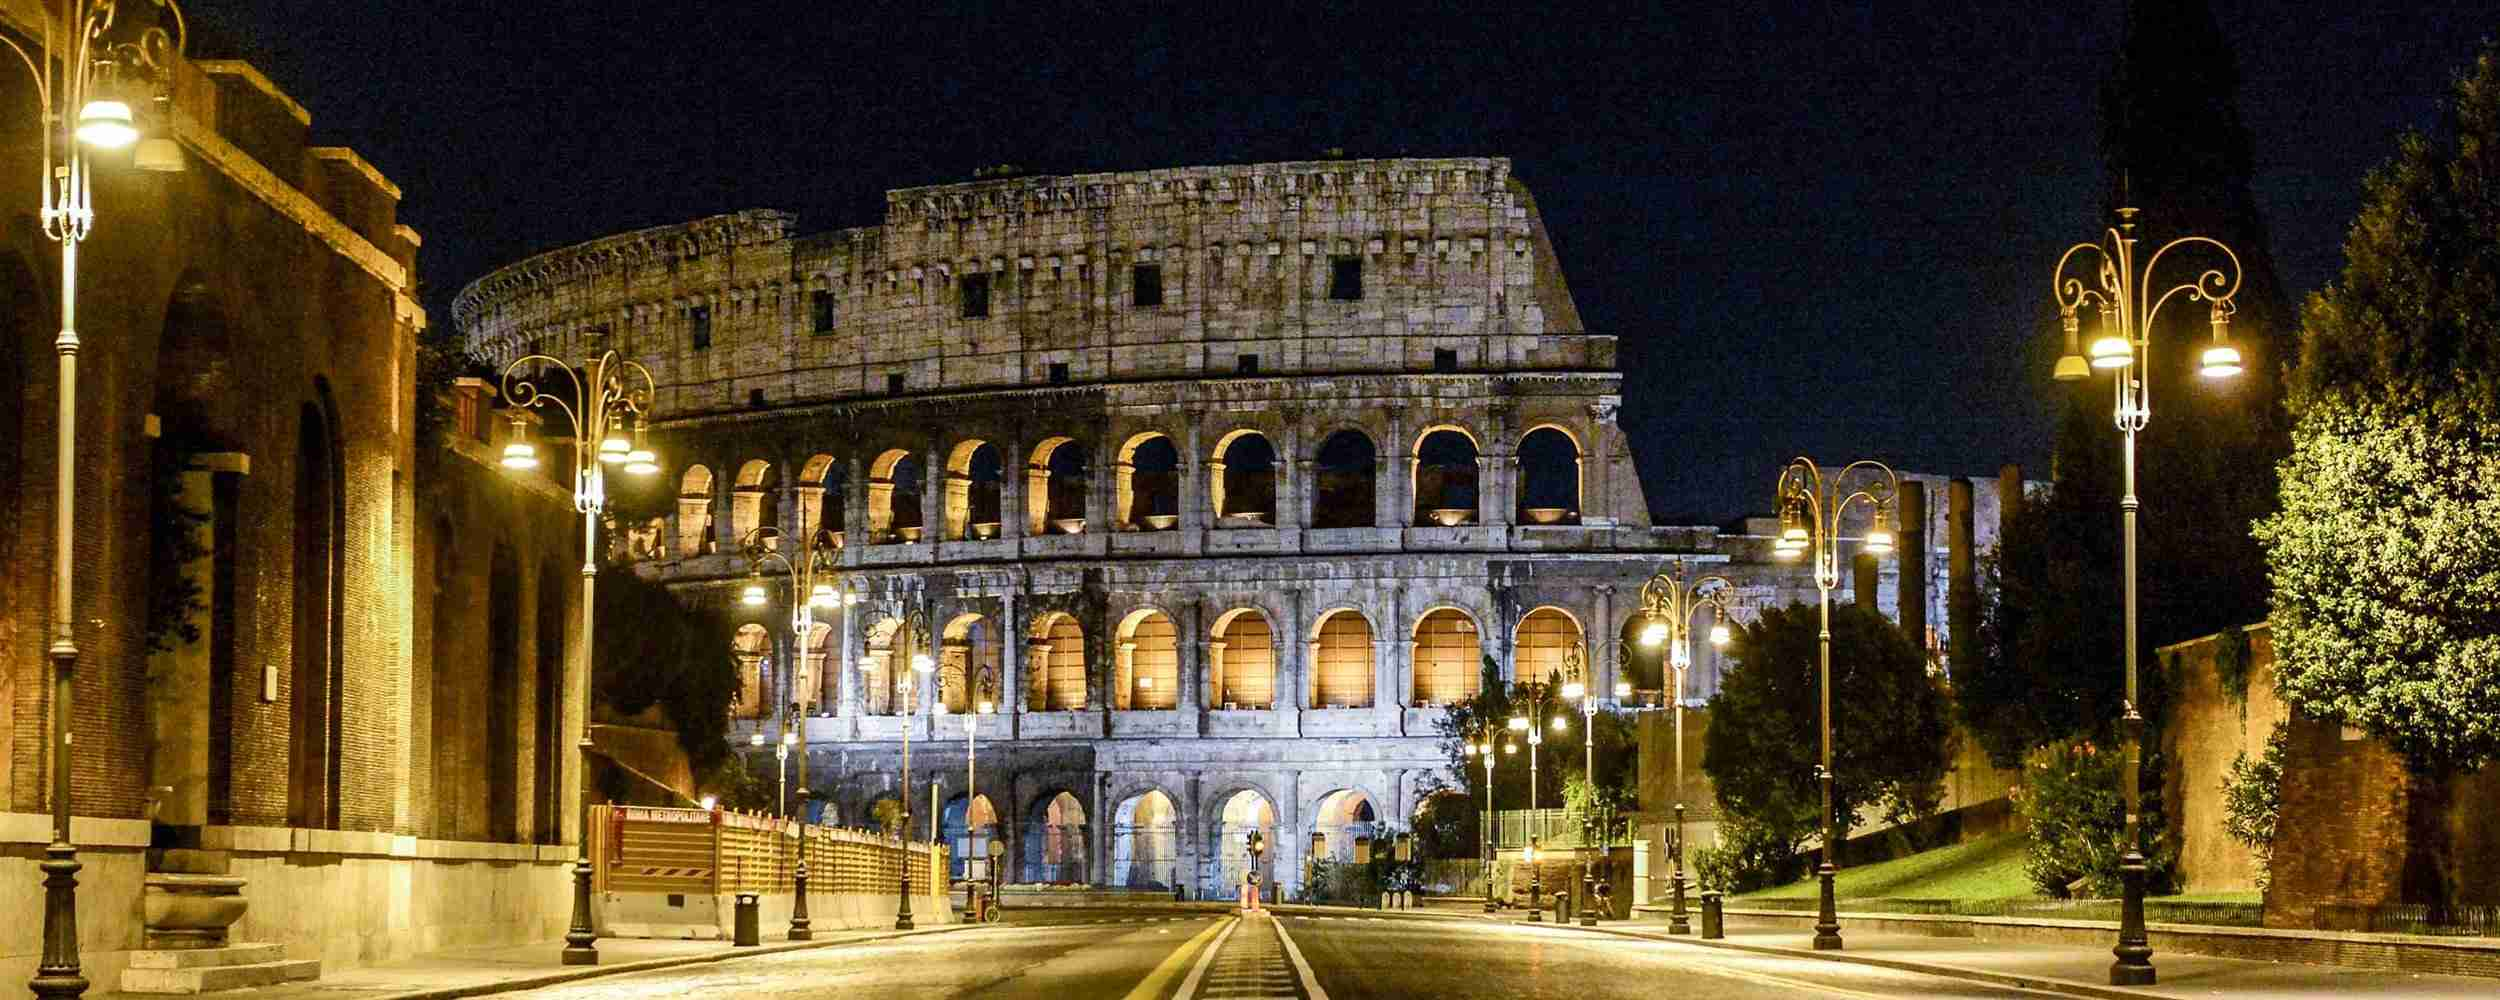 Colosseum Visit